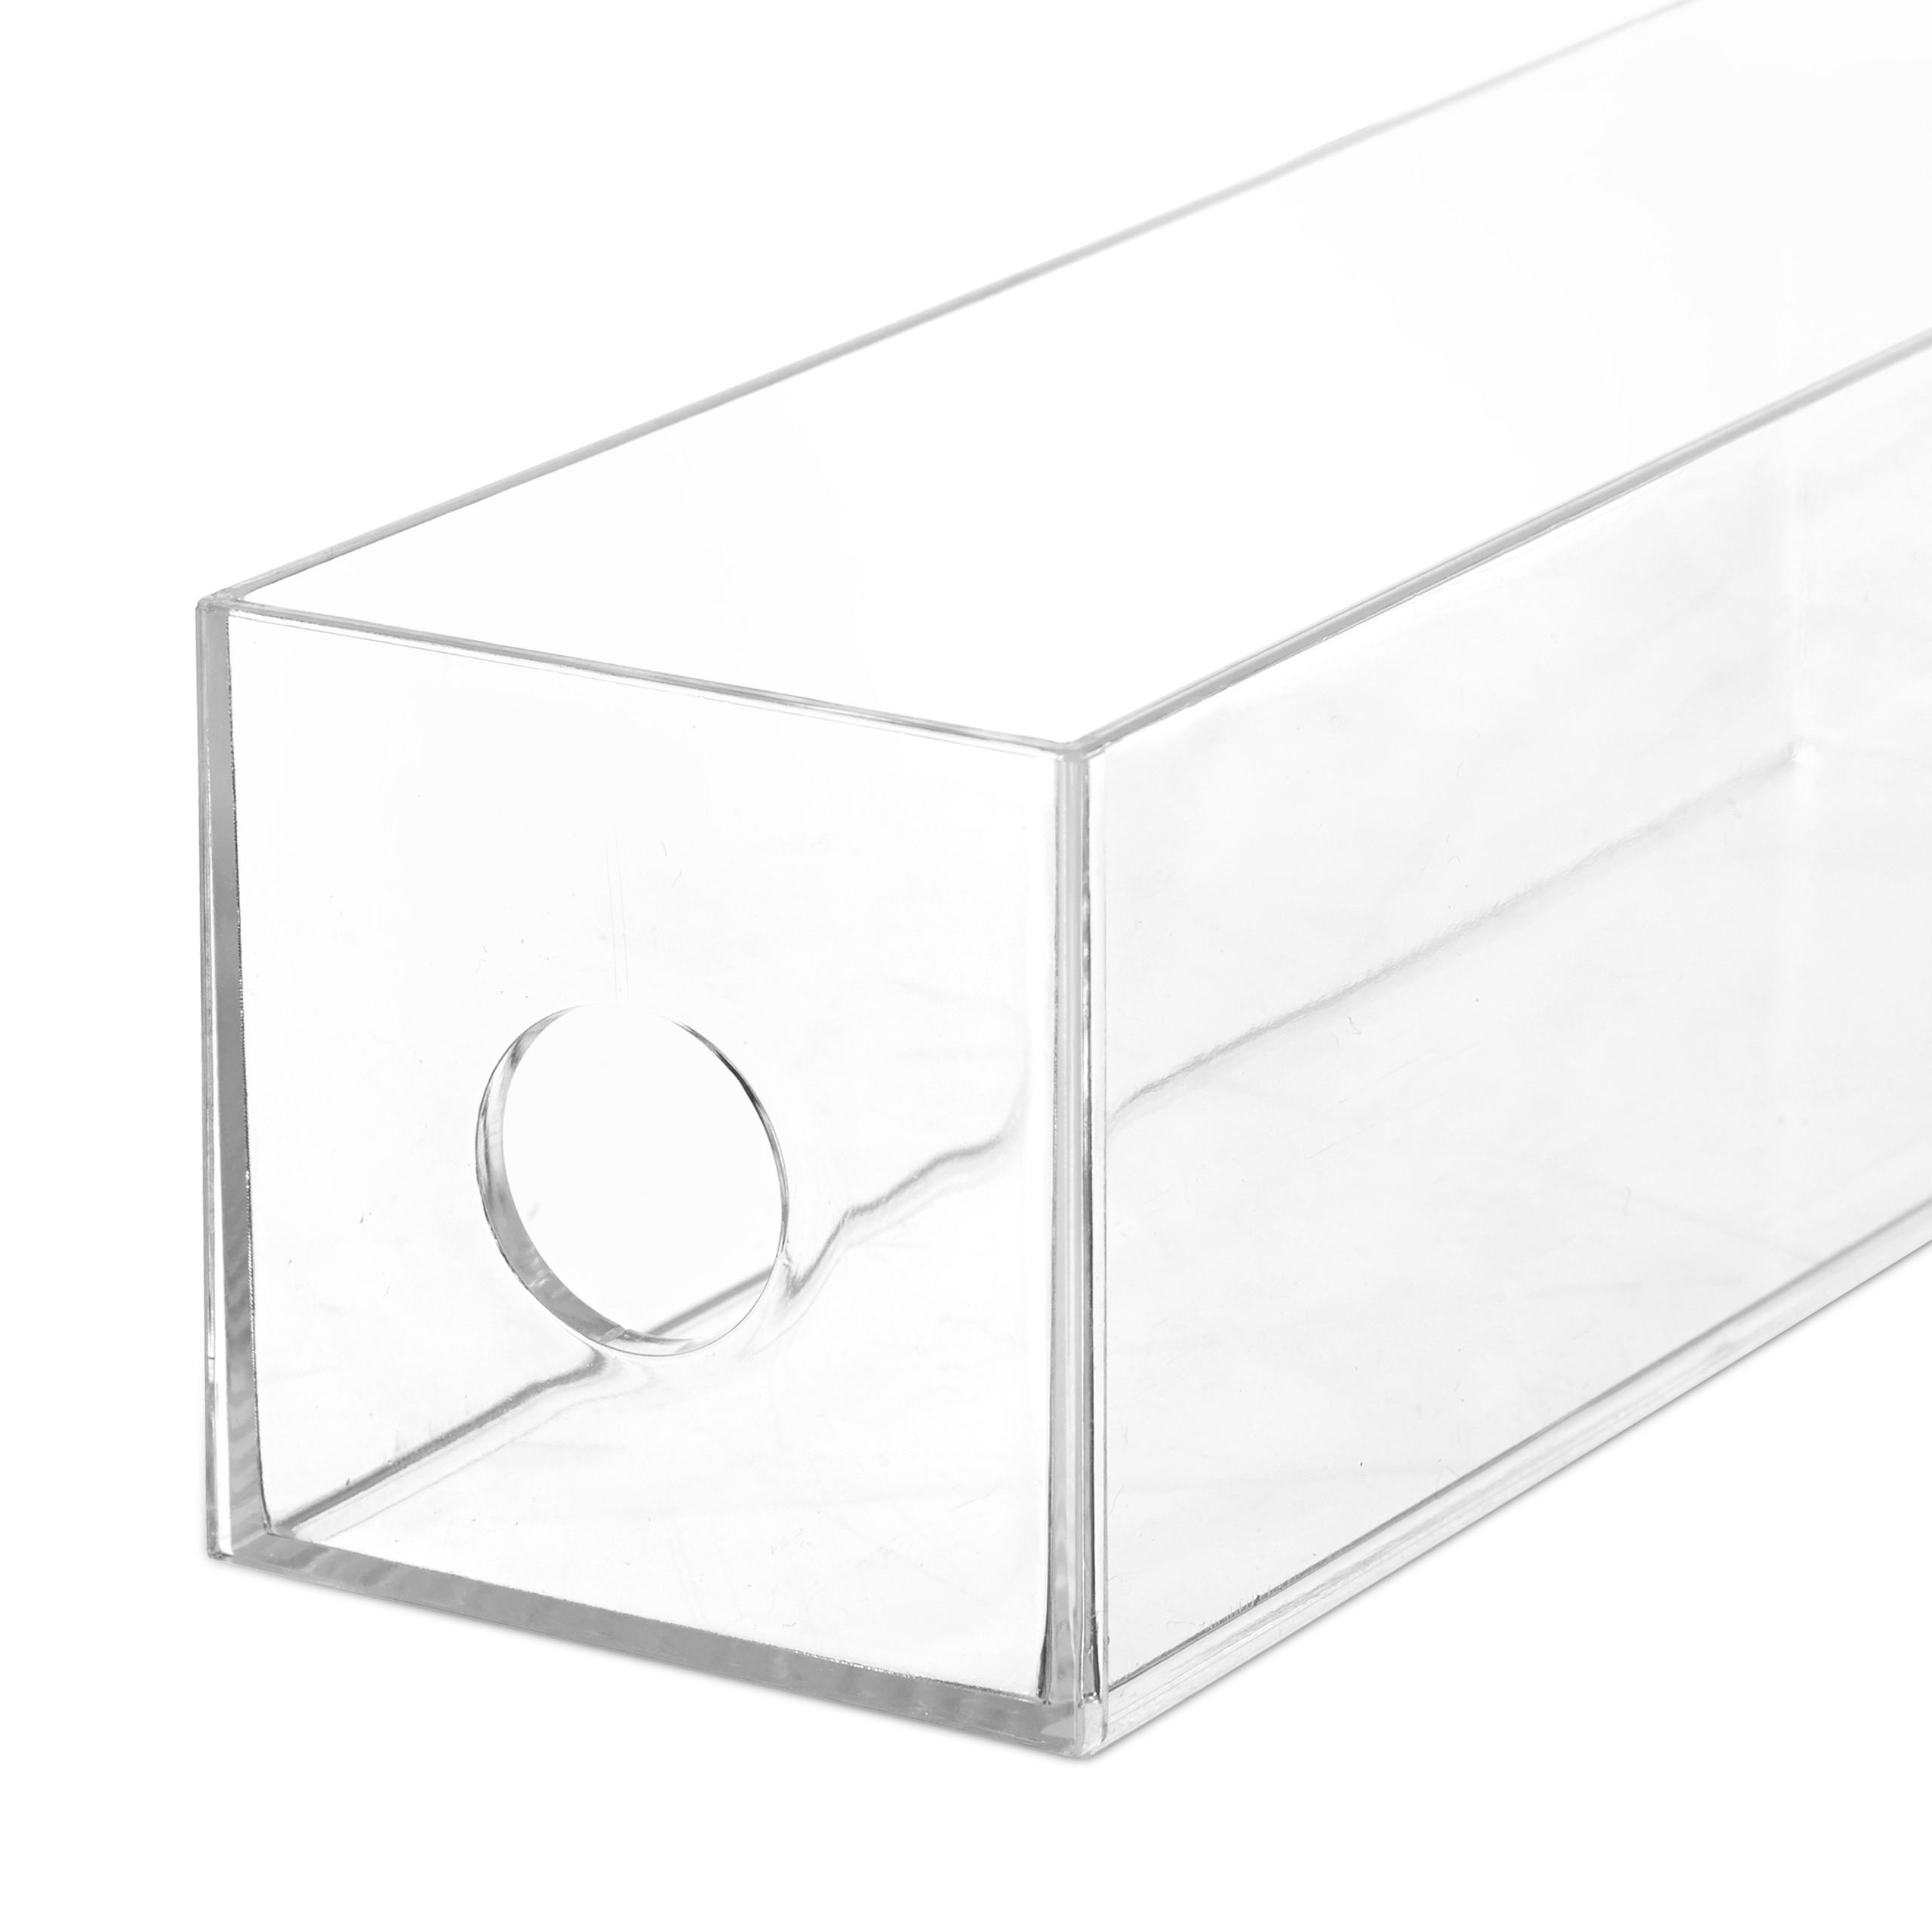 Transparent-Make-Up-Organiser-Storage-Box-with-4-Drawers thumbnail 10